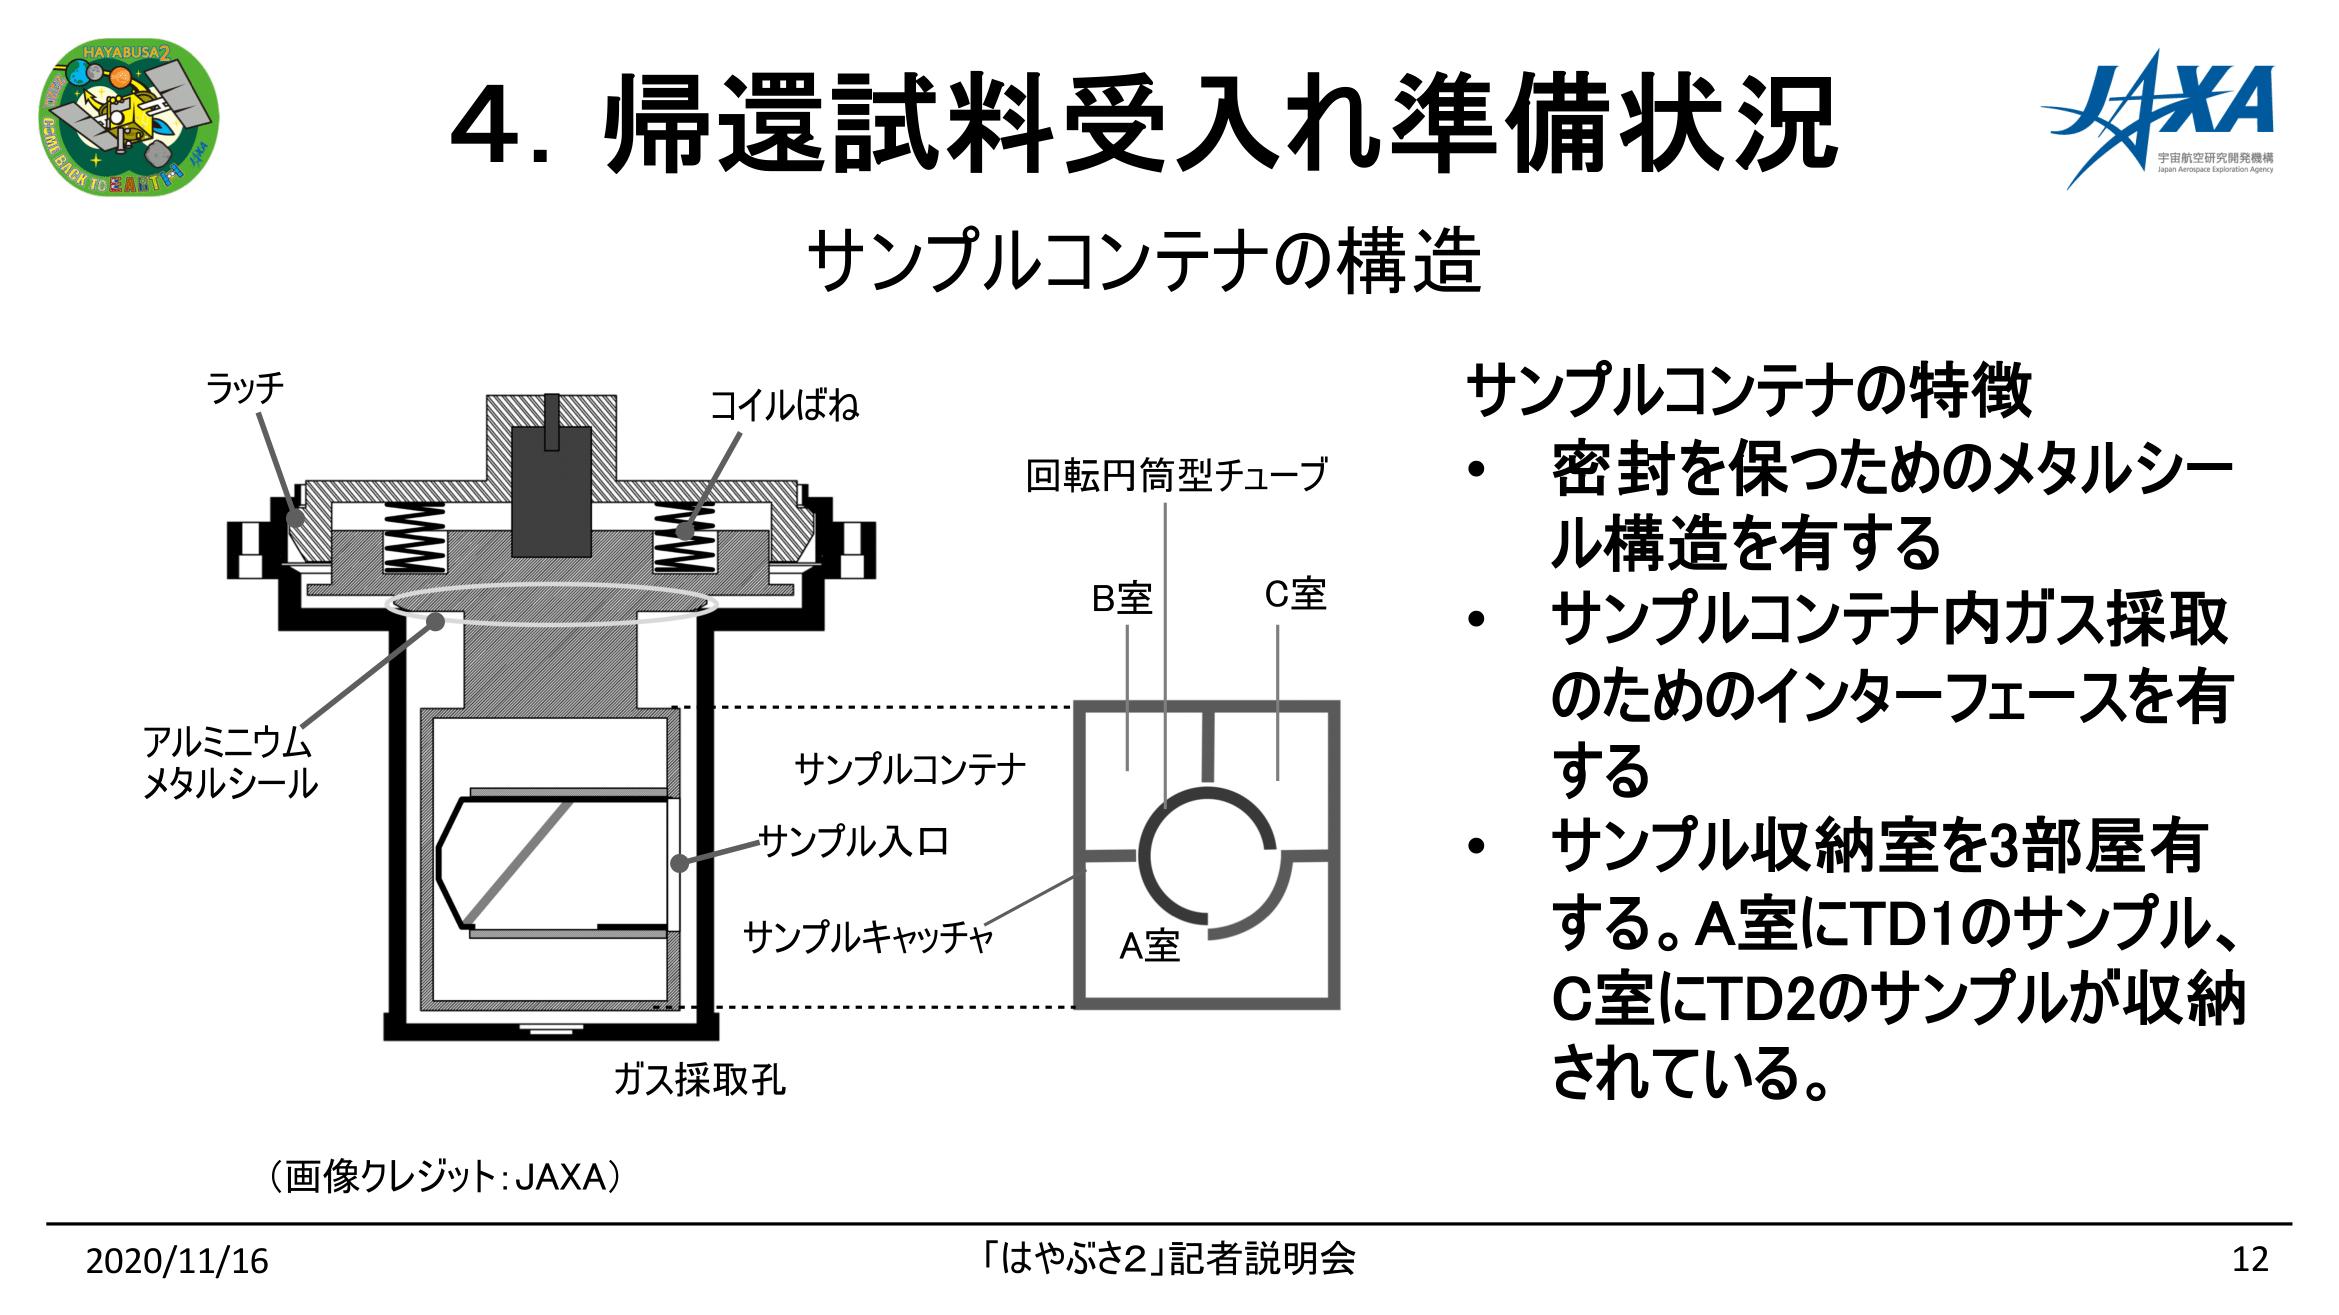 f:id:Imamura:20201116151228p:plain